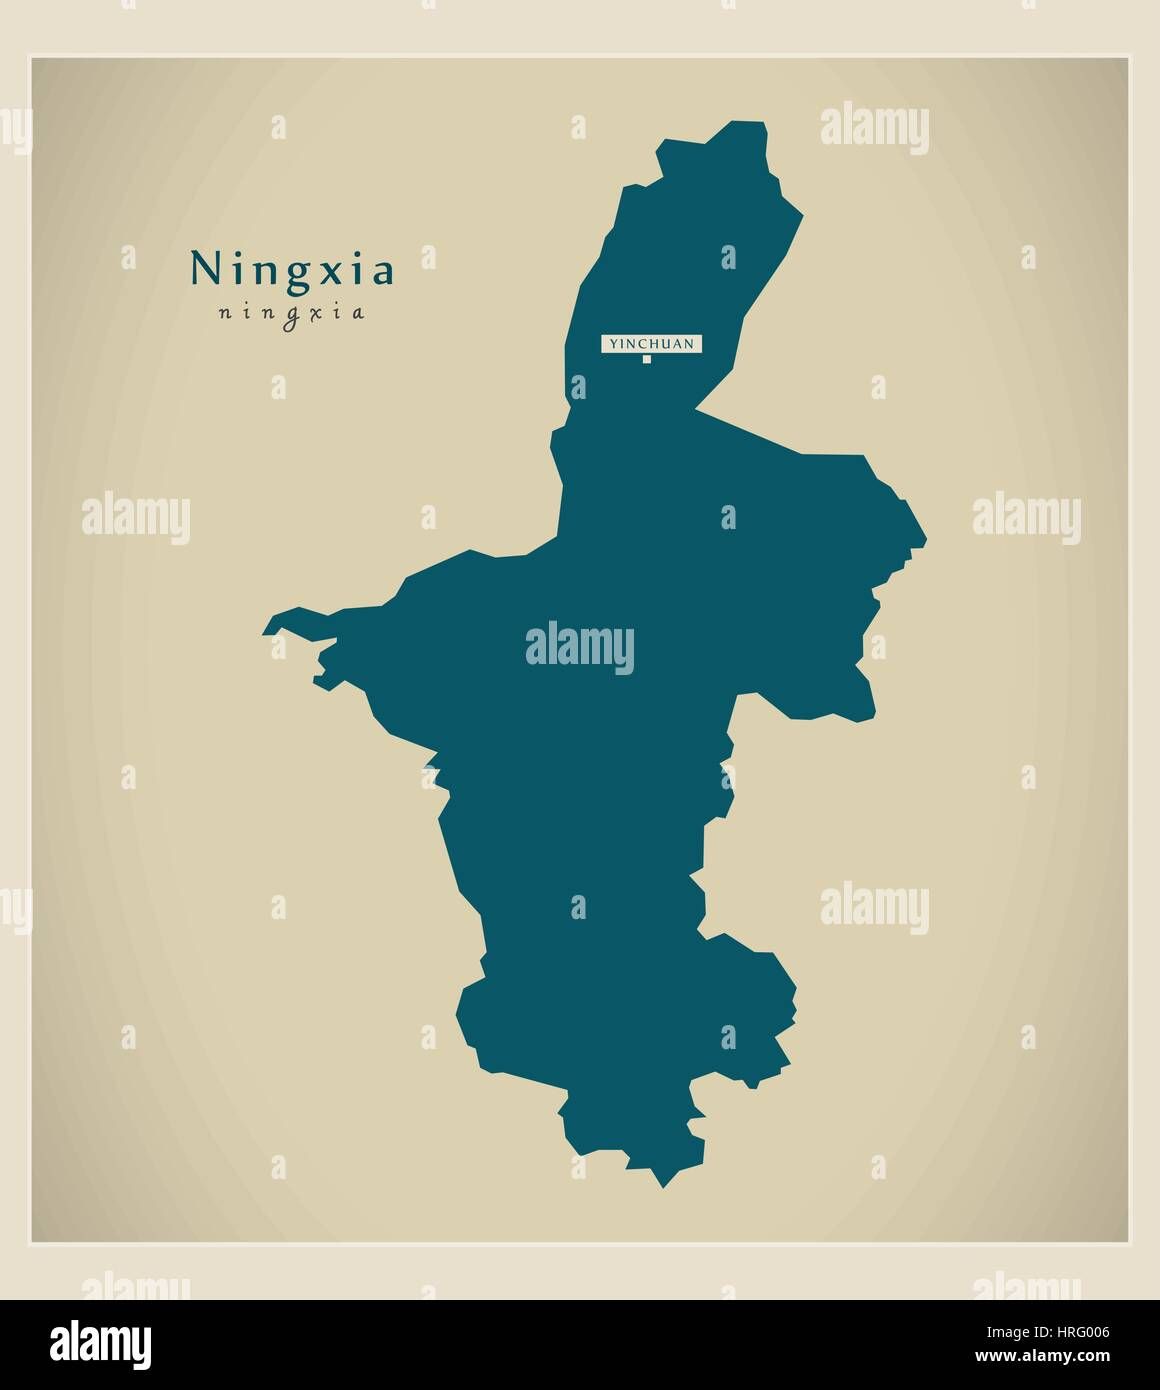 Ningxia China Map.Ningxia China Asia Map Stock Photos Ningxia China Asia Map Stock